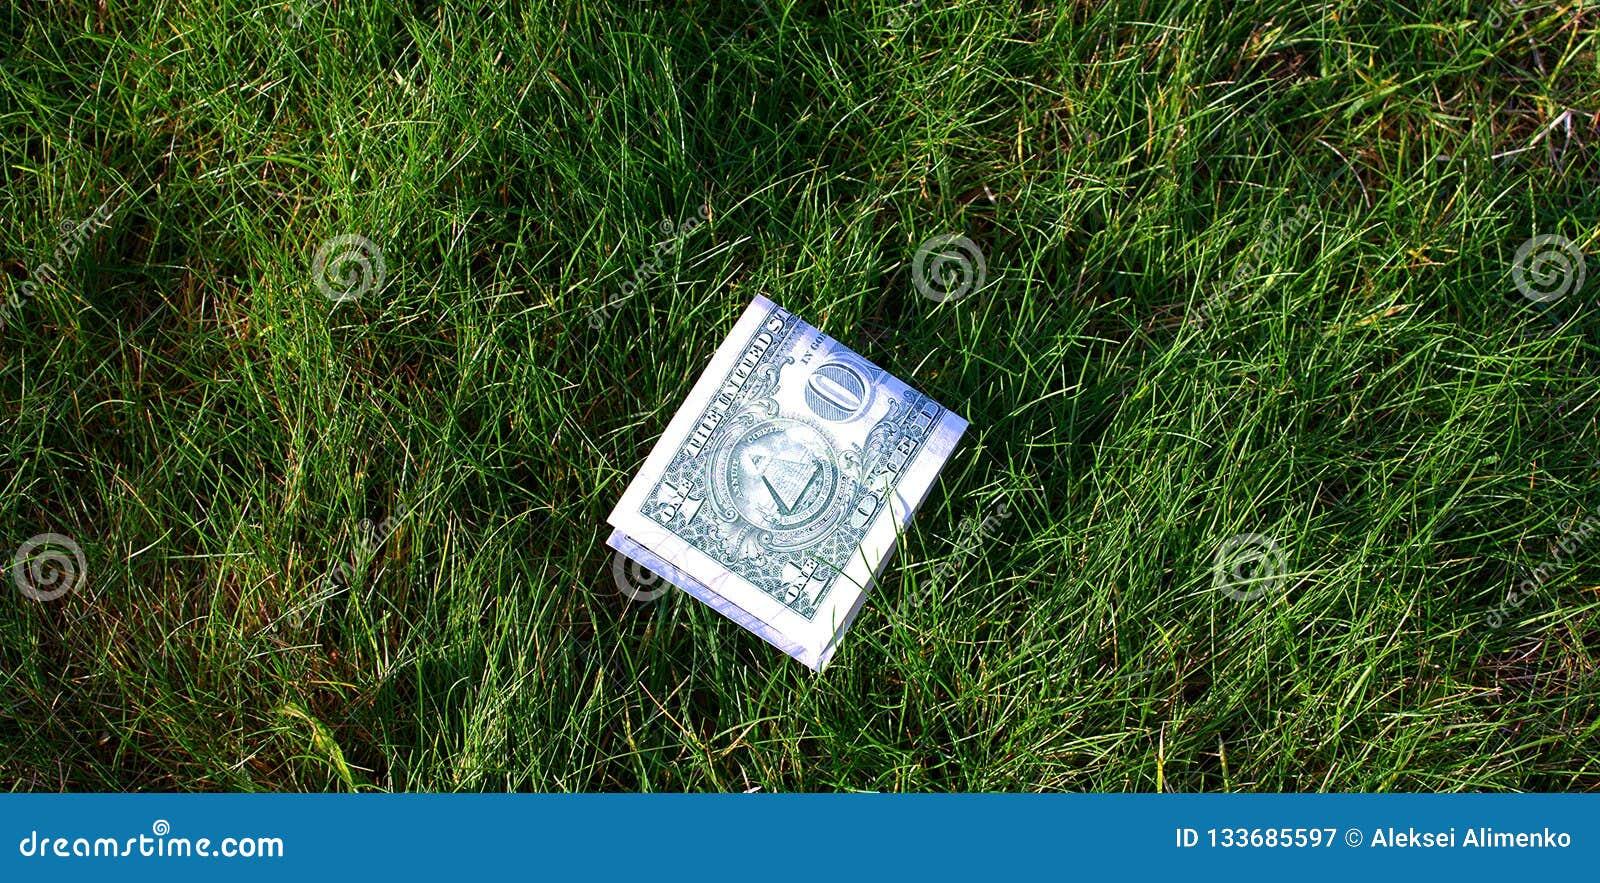 Green dollar folded in half on green grass.